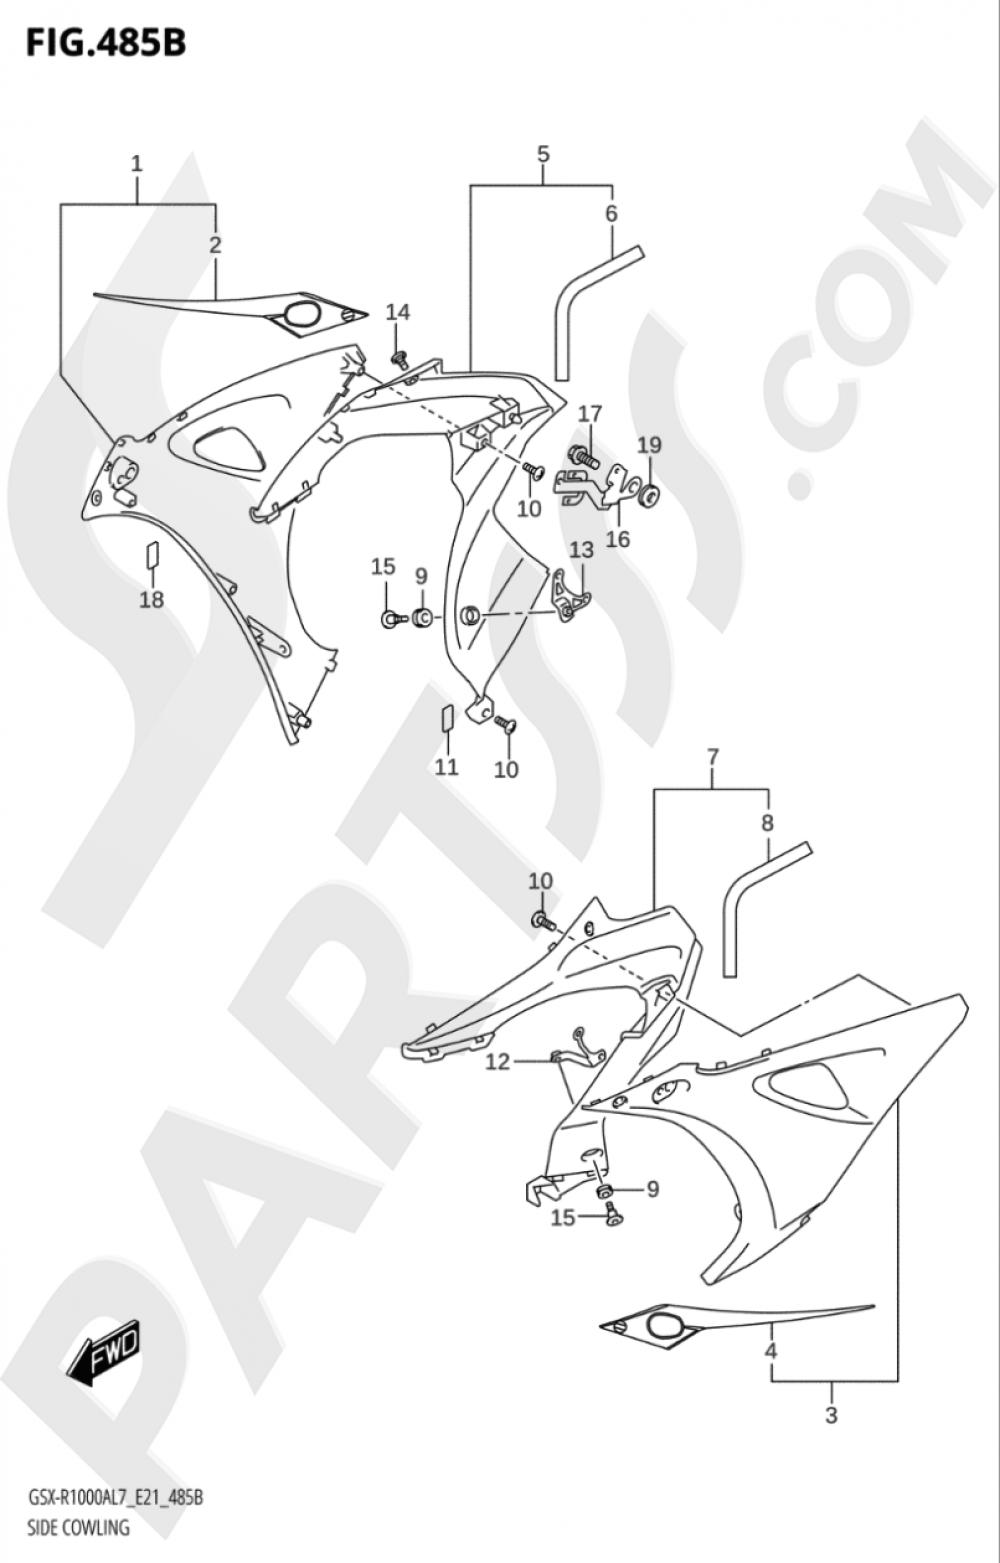 485B - SIDE COWLING Suzuki GSX-R1000A 2017